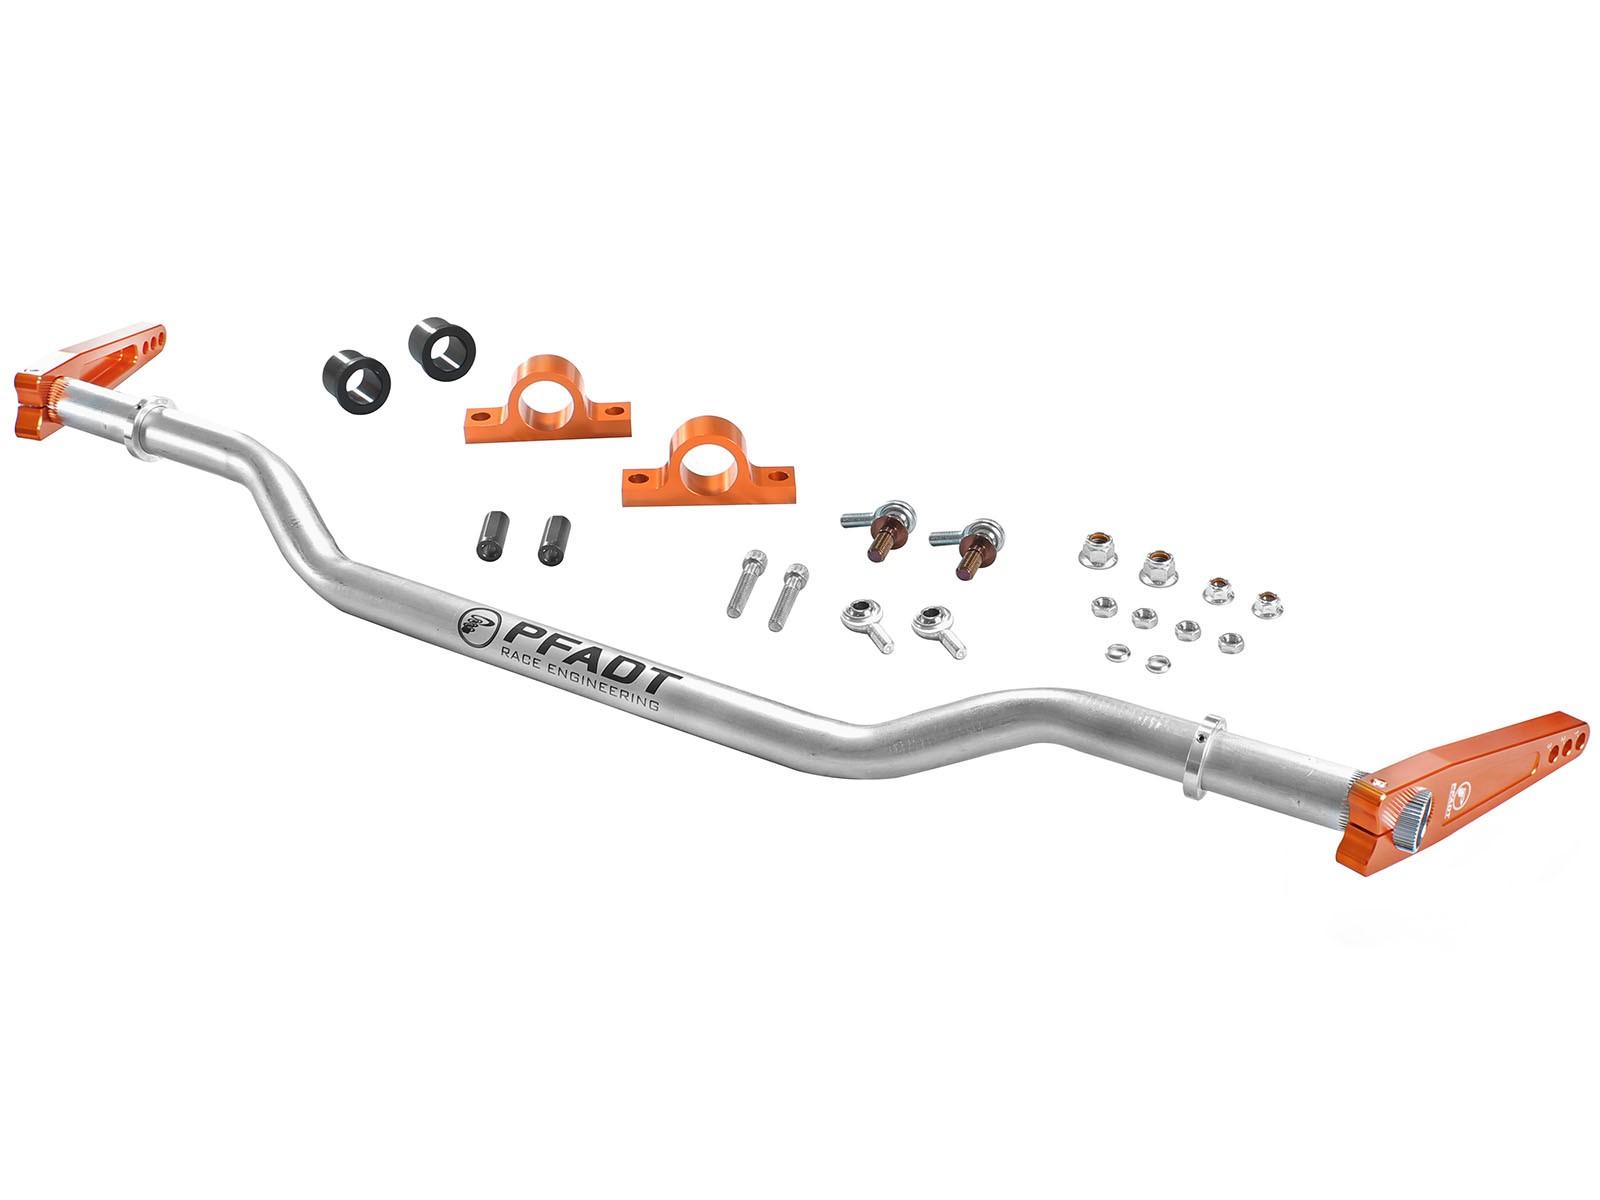 aFe POWER 440-401007-N aFe Control PFADT Series Drag Race Rear Sway Bar